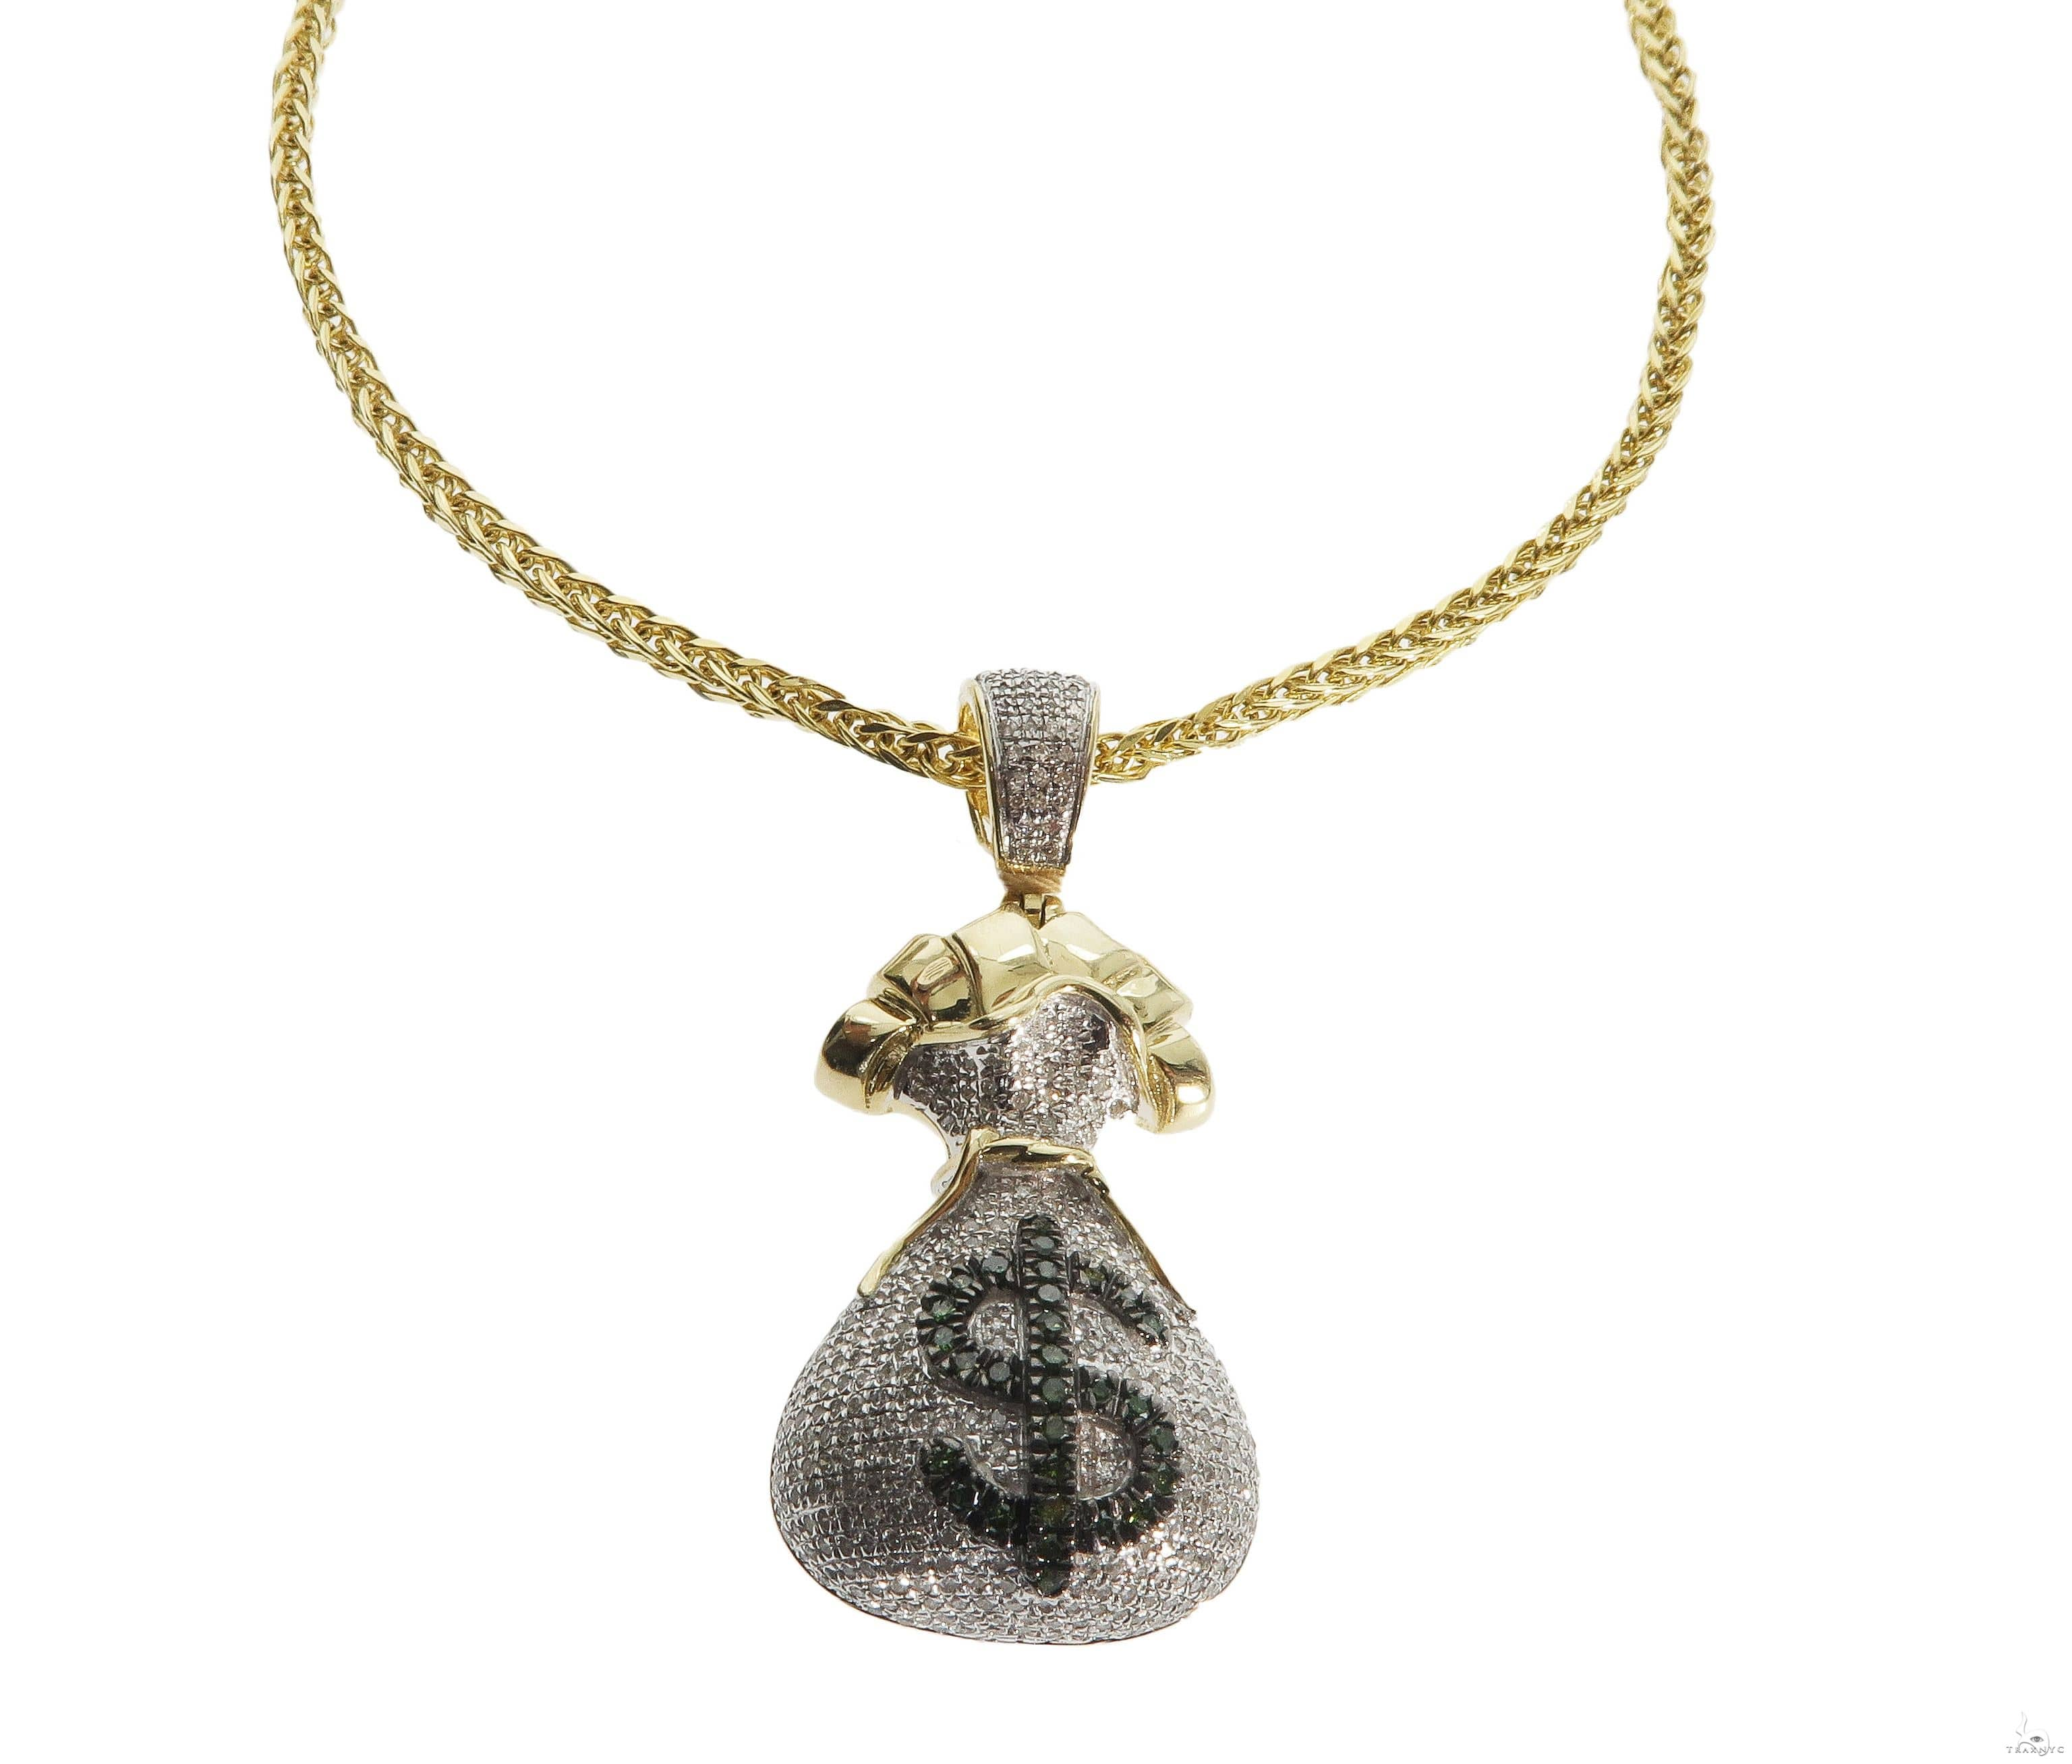 10K Gold Diamond Money Bag Dollar Sign Charm and Chain Set Metal